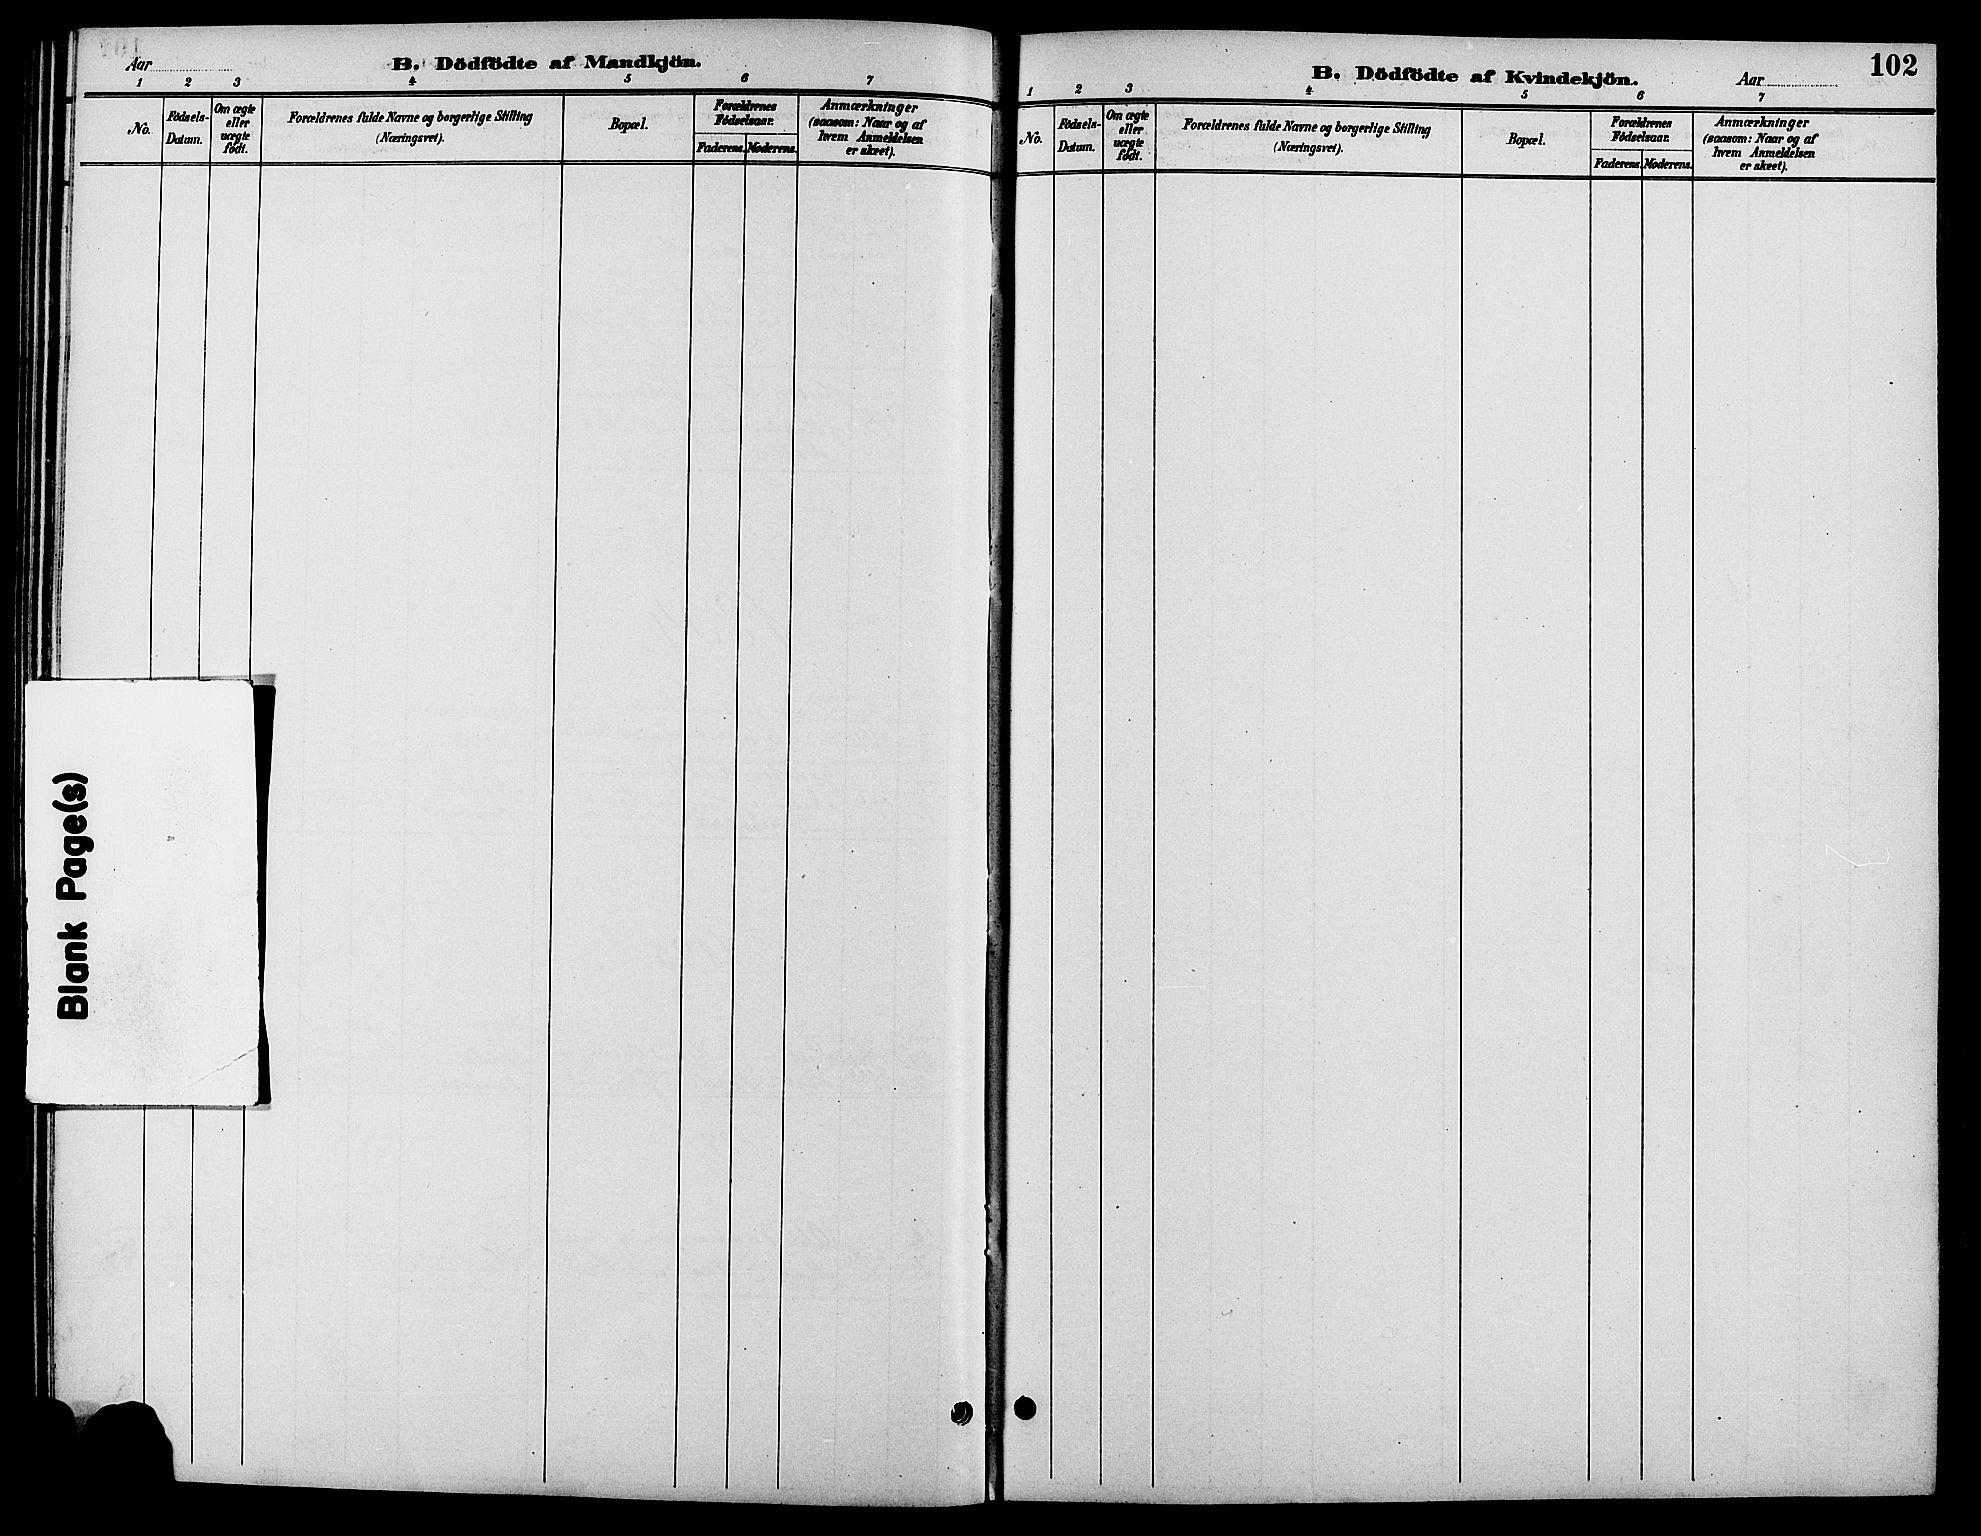 SAH, Biri prestekontor, Klokkerbok nr. 4, 1892-1909, s. 102